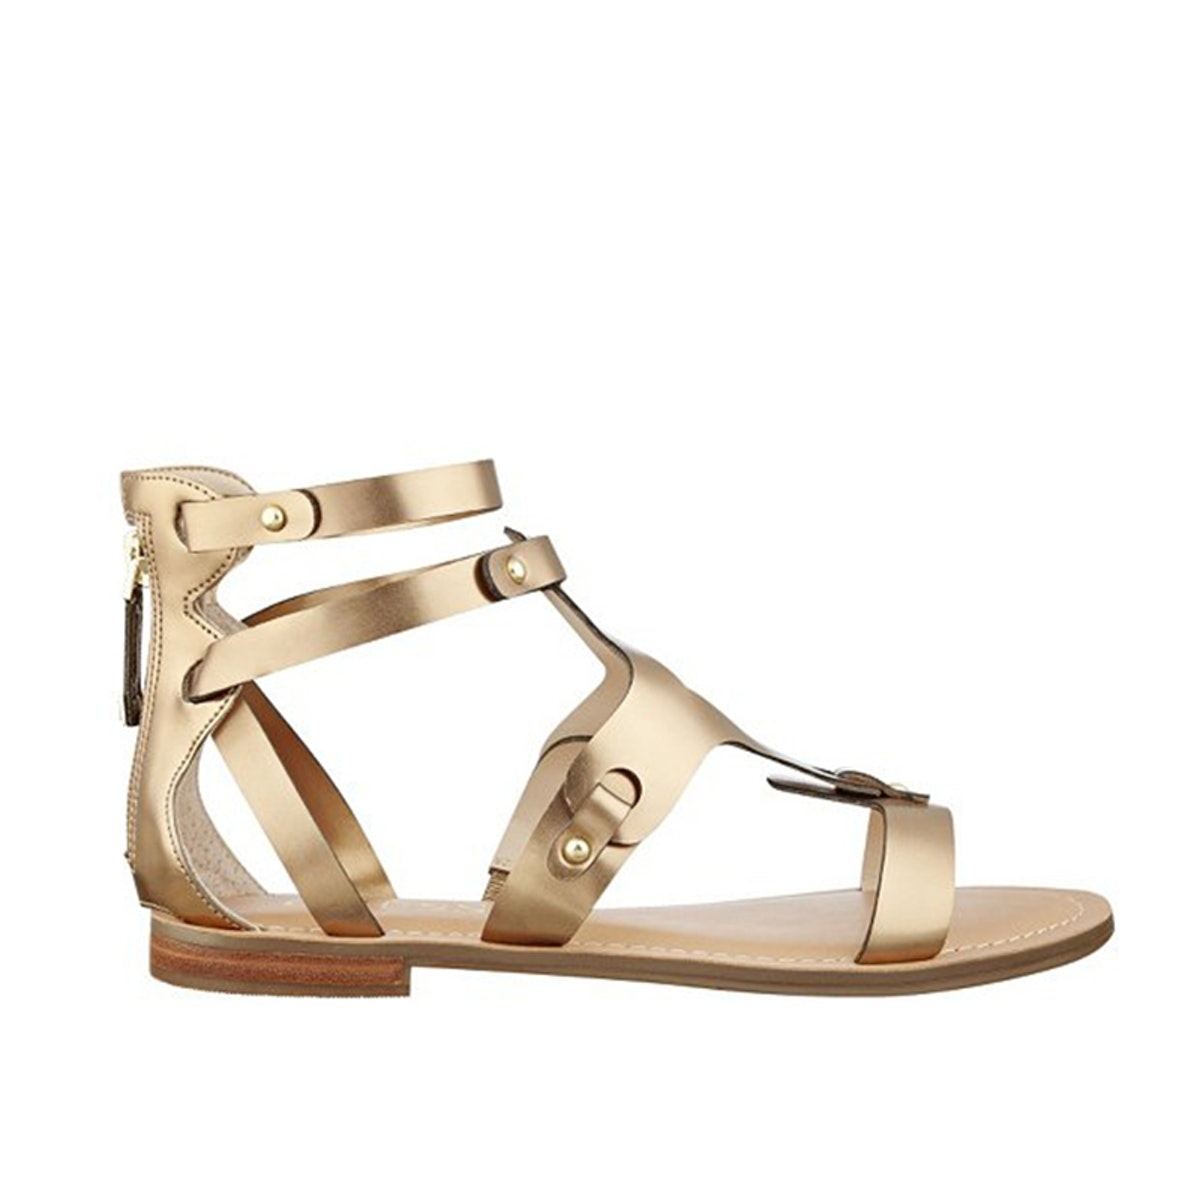 Mabyn Gladiator Sandals